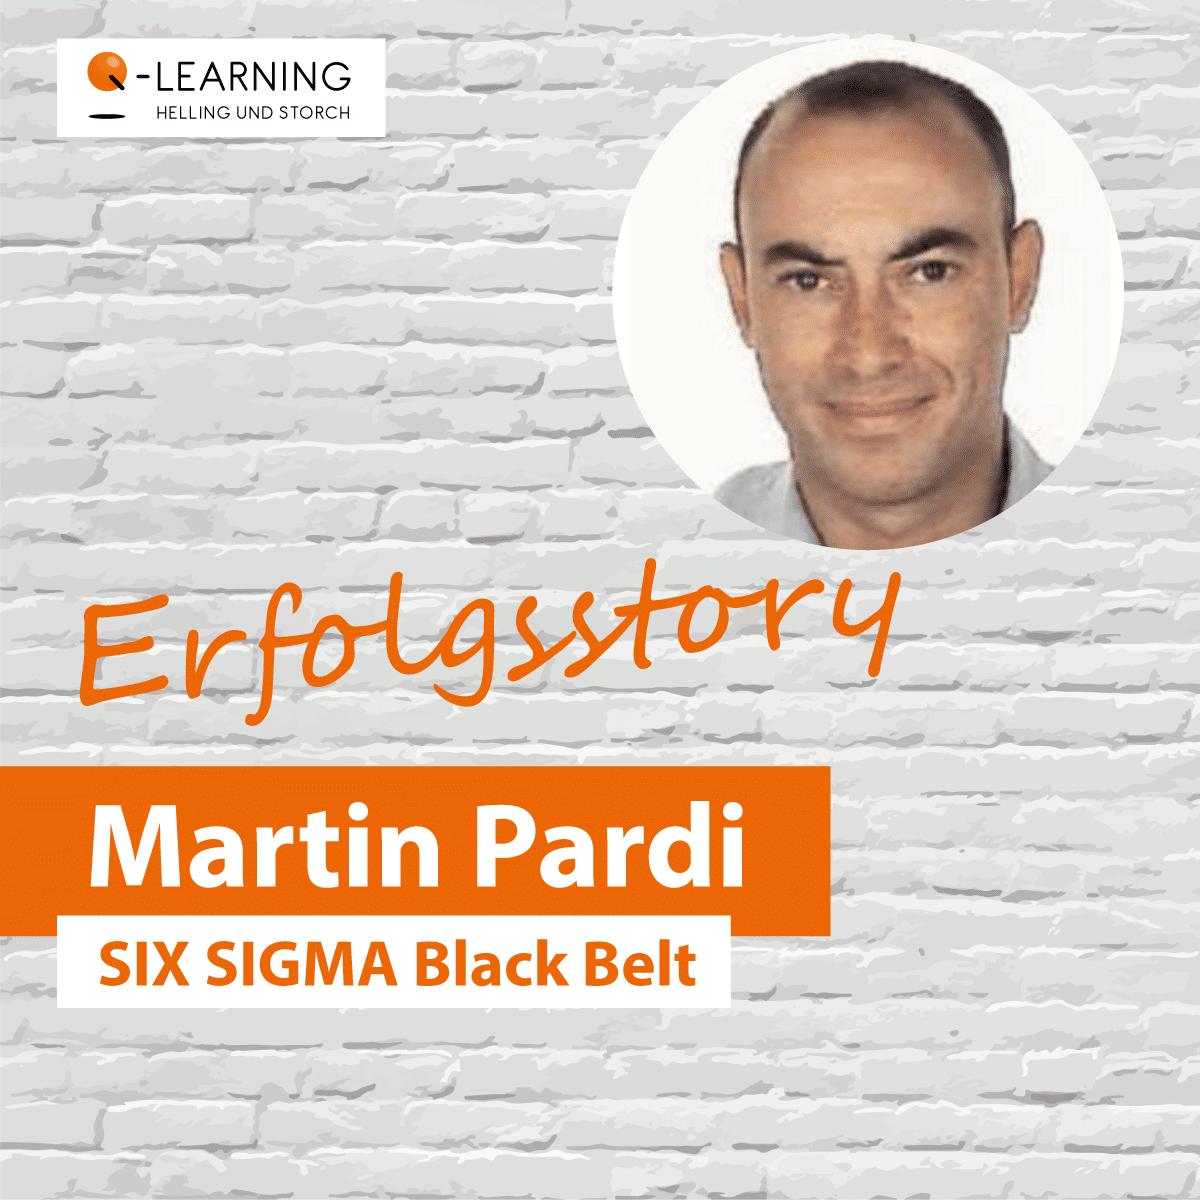 Portrait Bewertung Martin Pardi - SIX SIGMA Black Belt